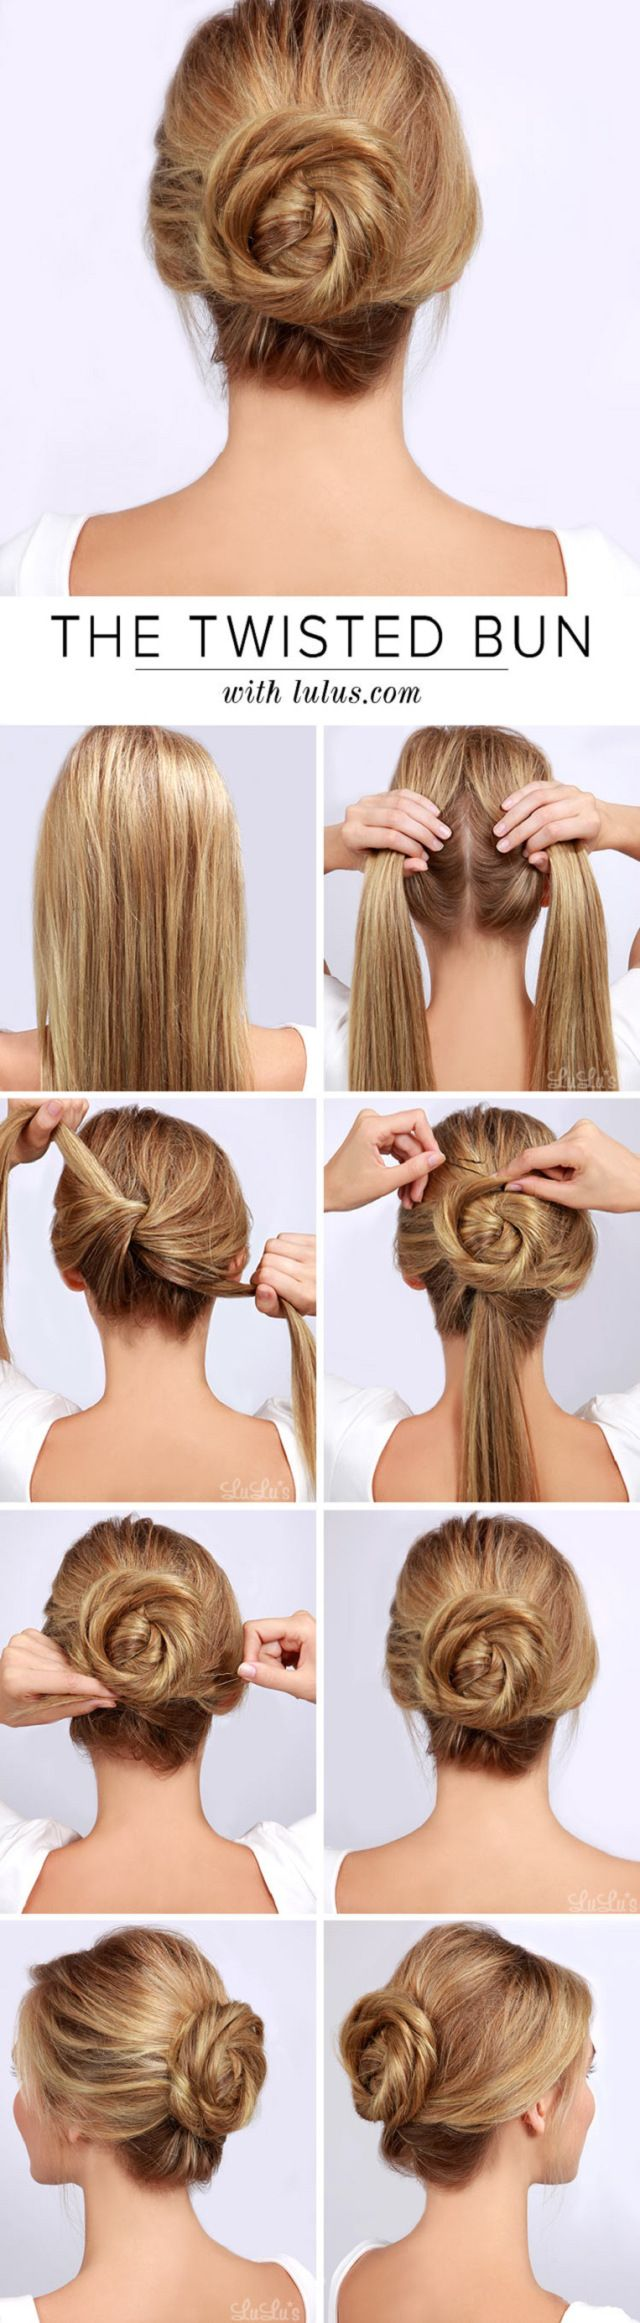 Twisted Bun Hair Tutorial   12 Best Beauty Tutorials for Fall 2014 http://www.jexshop.com/